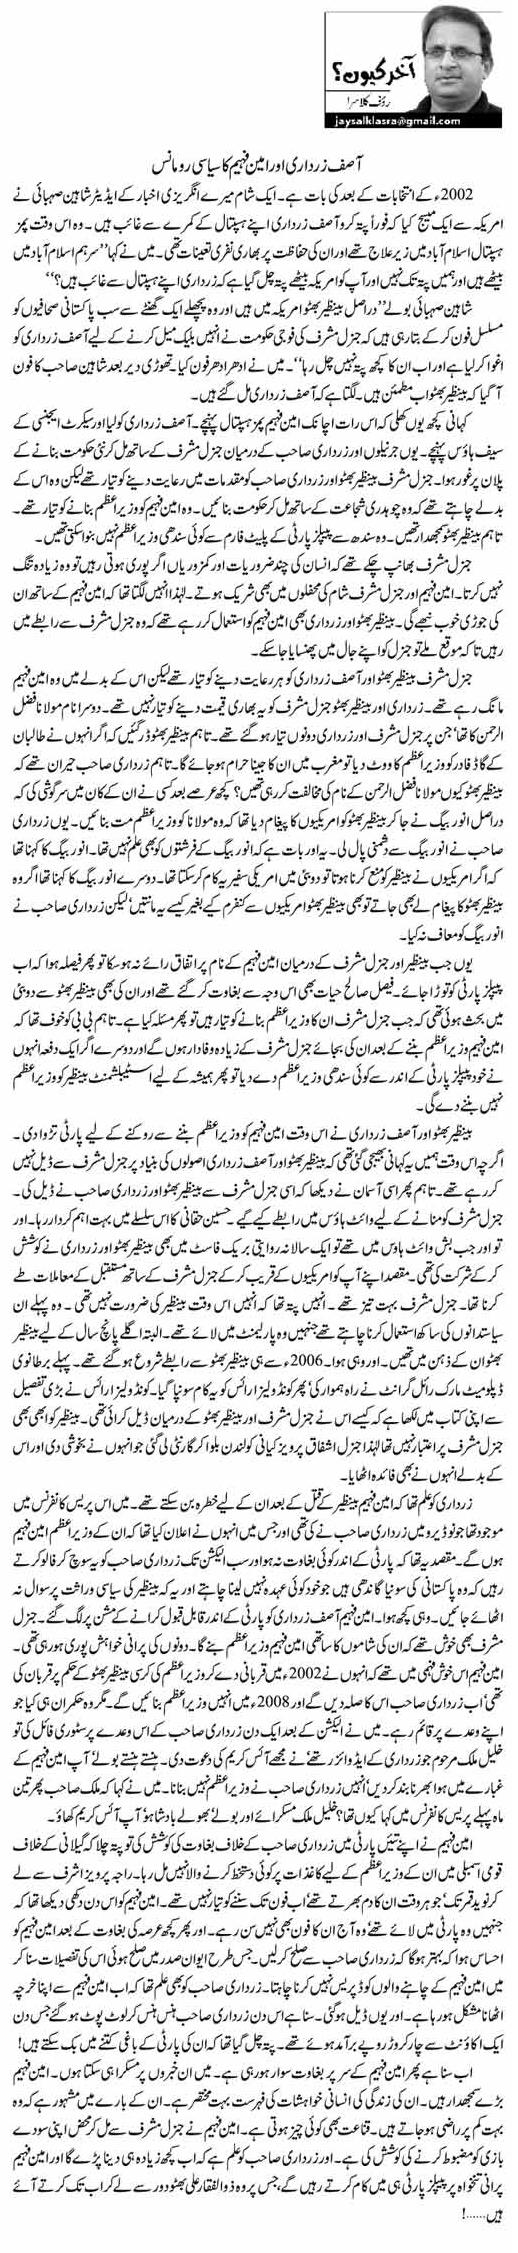 Asif Zardari Aur Amin Faheem Ka Romance - Rauf Klasra - Pakfunny